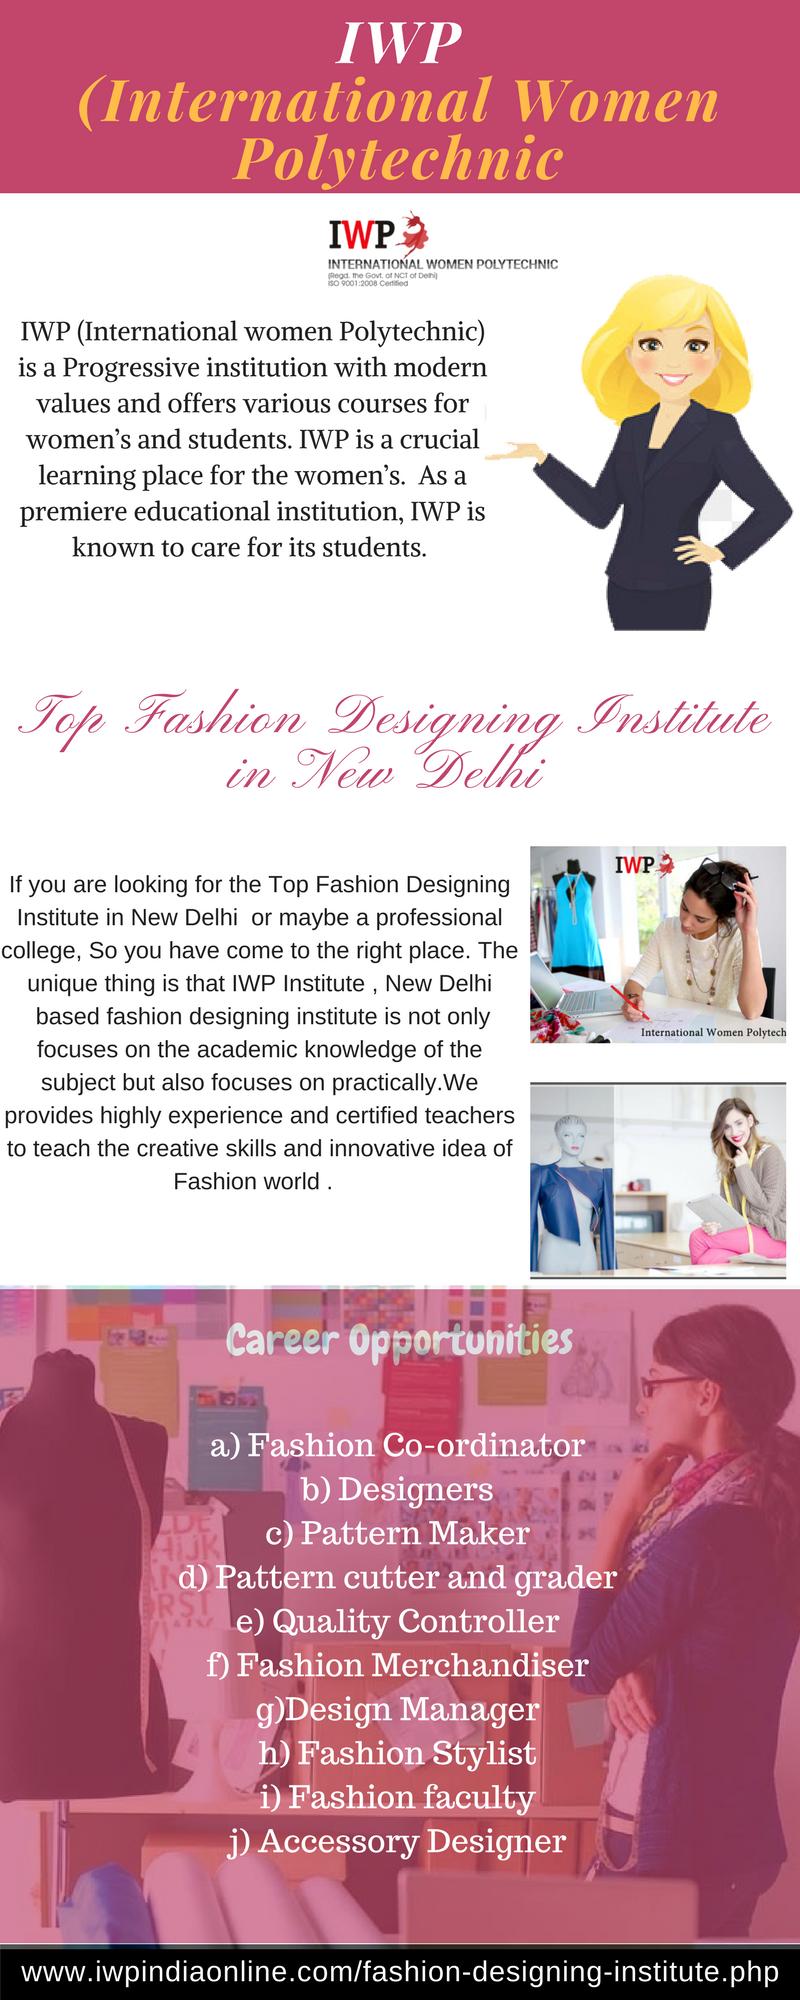 Ame Wilson On Twitter Top Fashion Designing Institute In New Delhi Https T Co Vhplzkxela Iwpinstitute Fashiondesigninginstitute